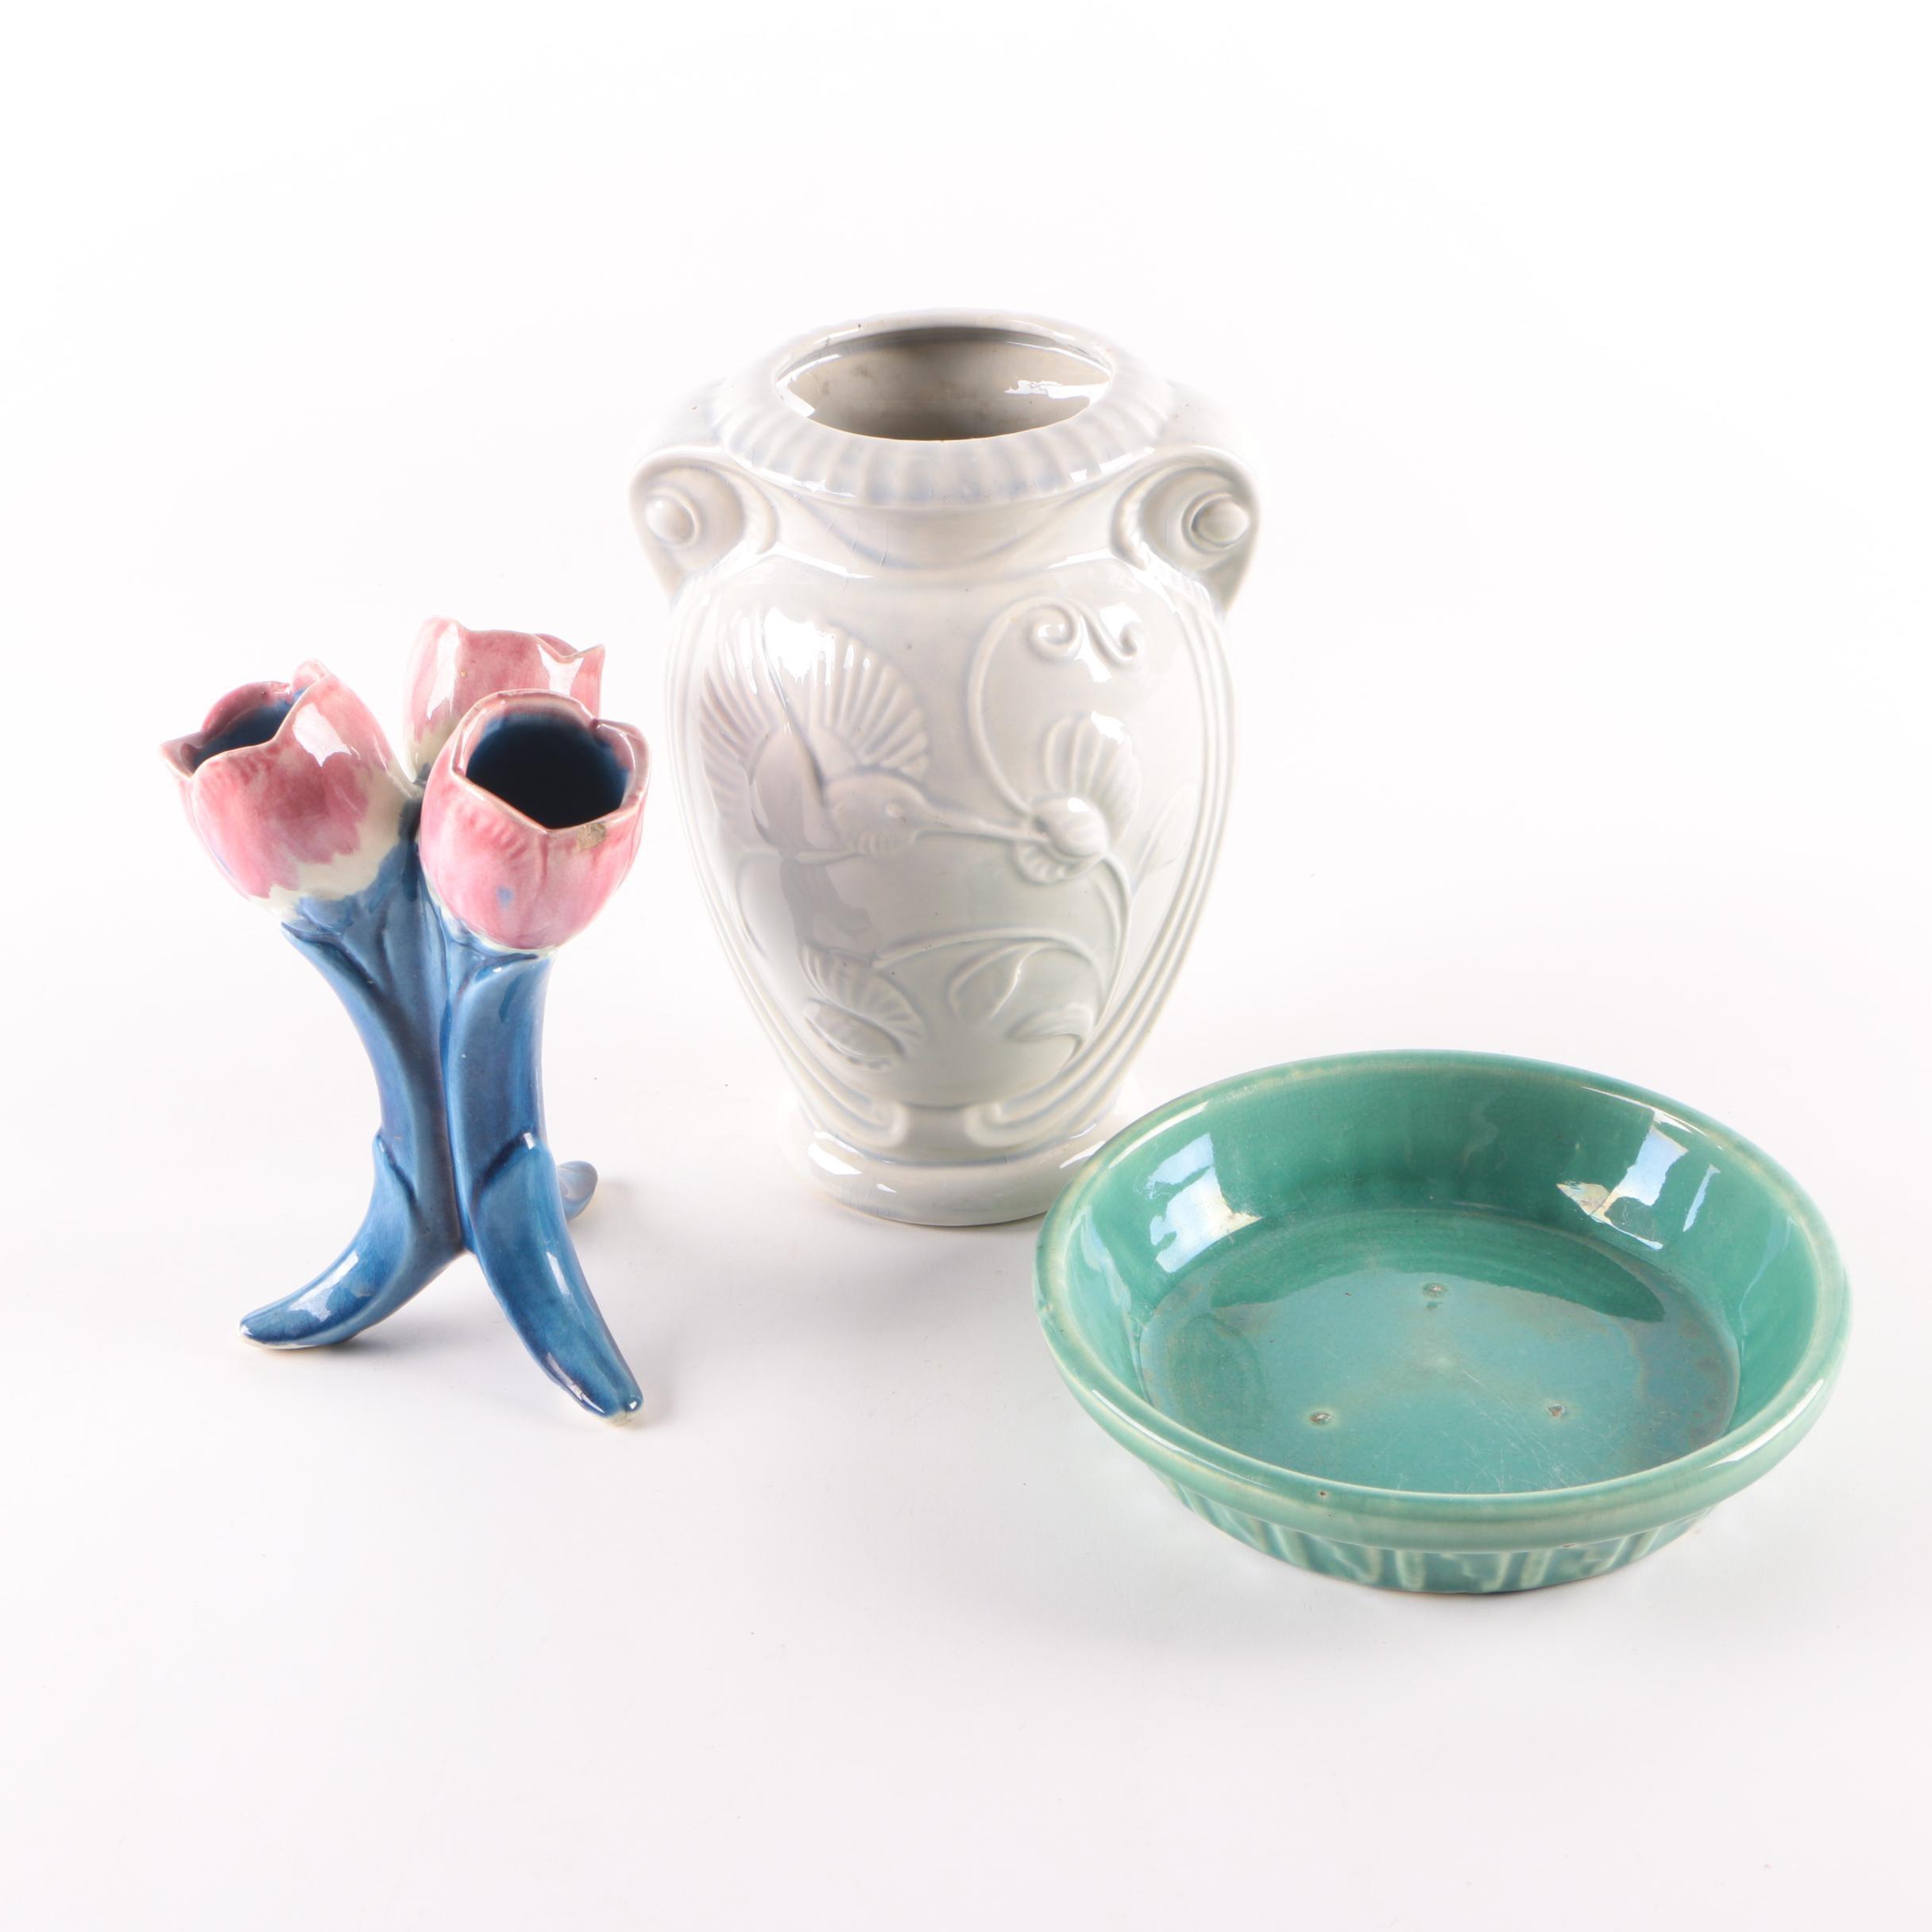 Vintage Ceramic Vases and Underplate